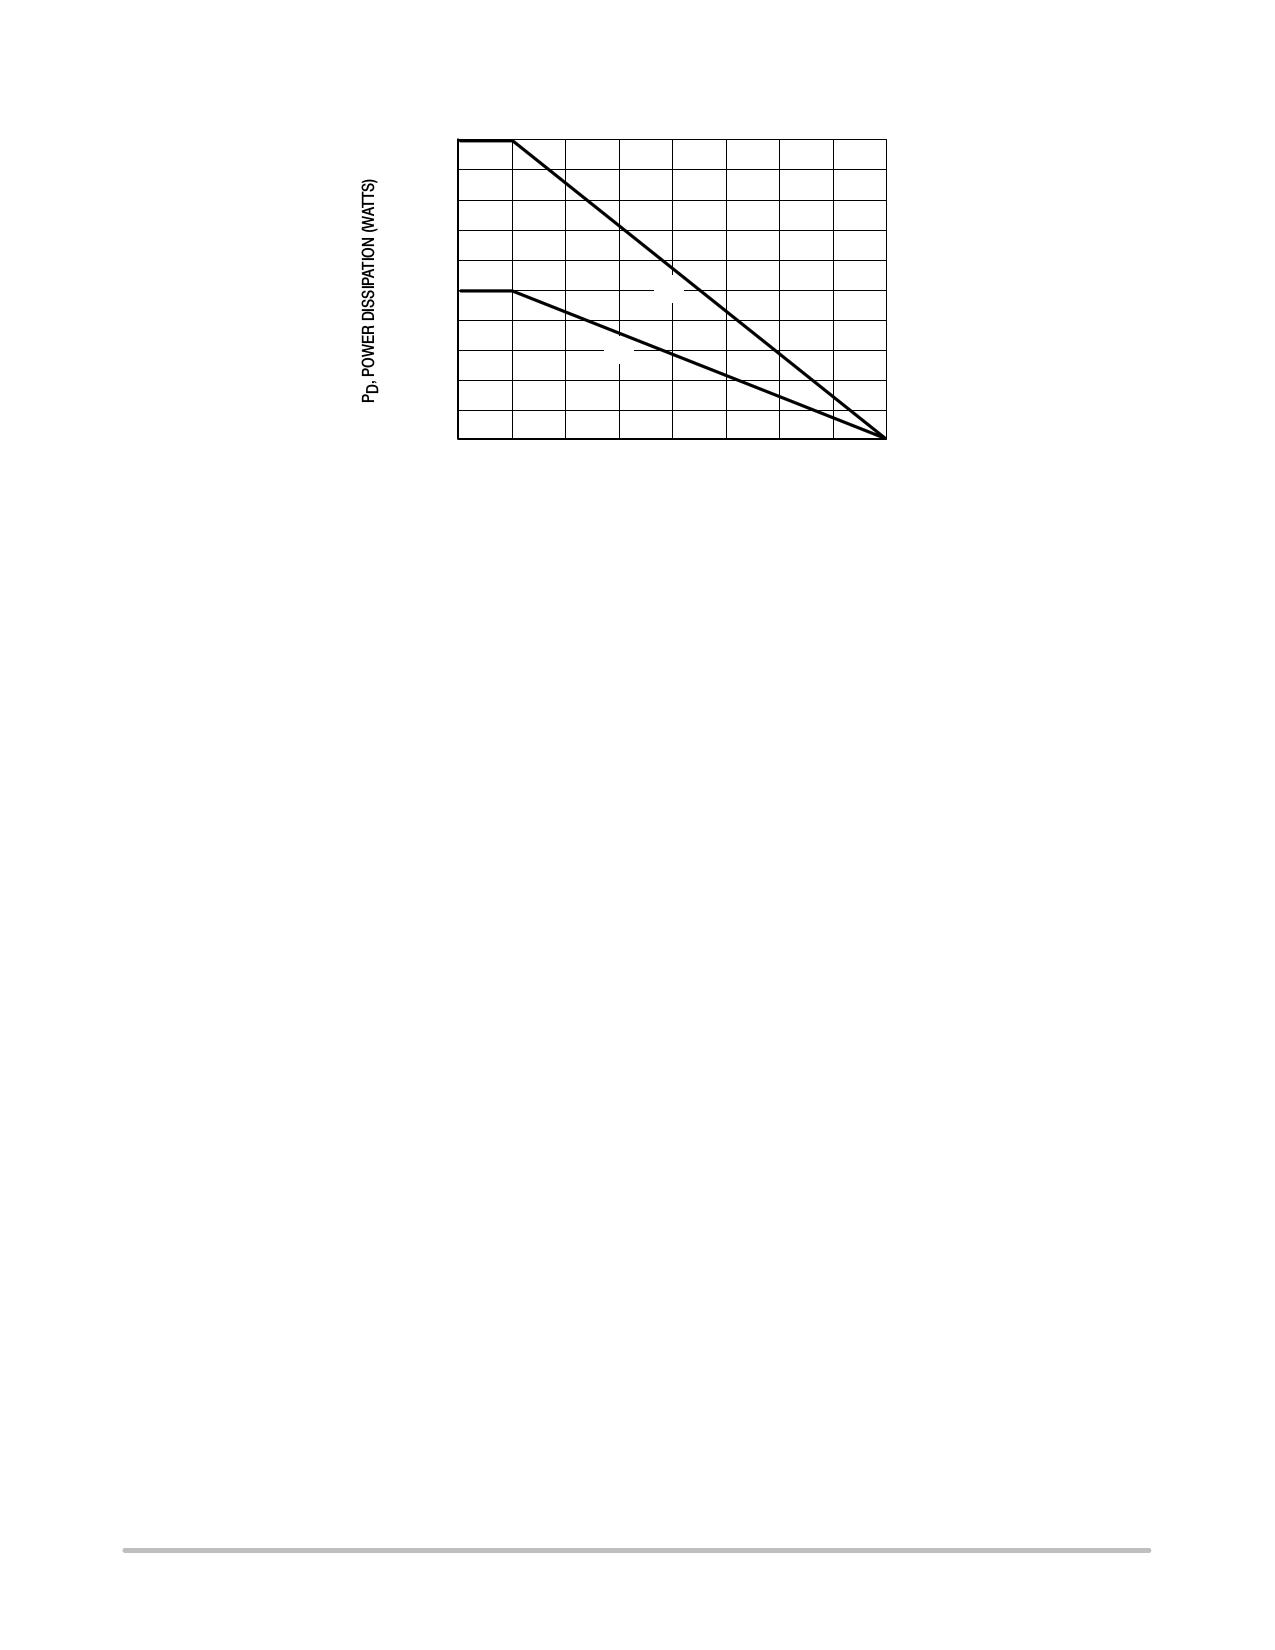 2N4399 pdf, equivalent, schematic